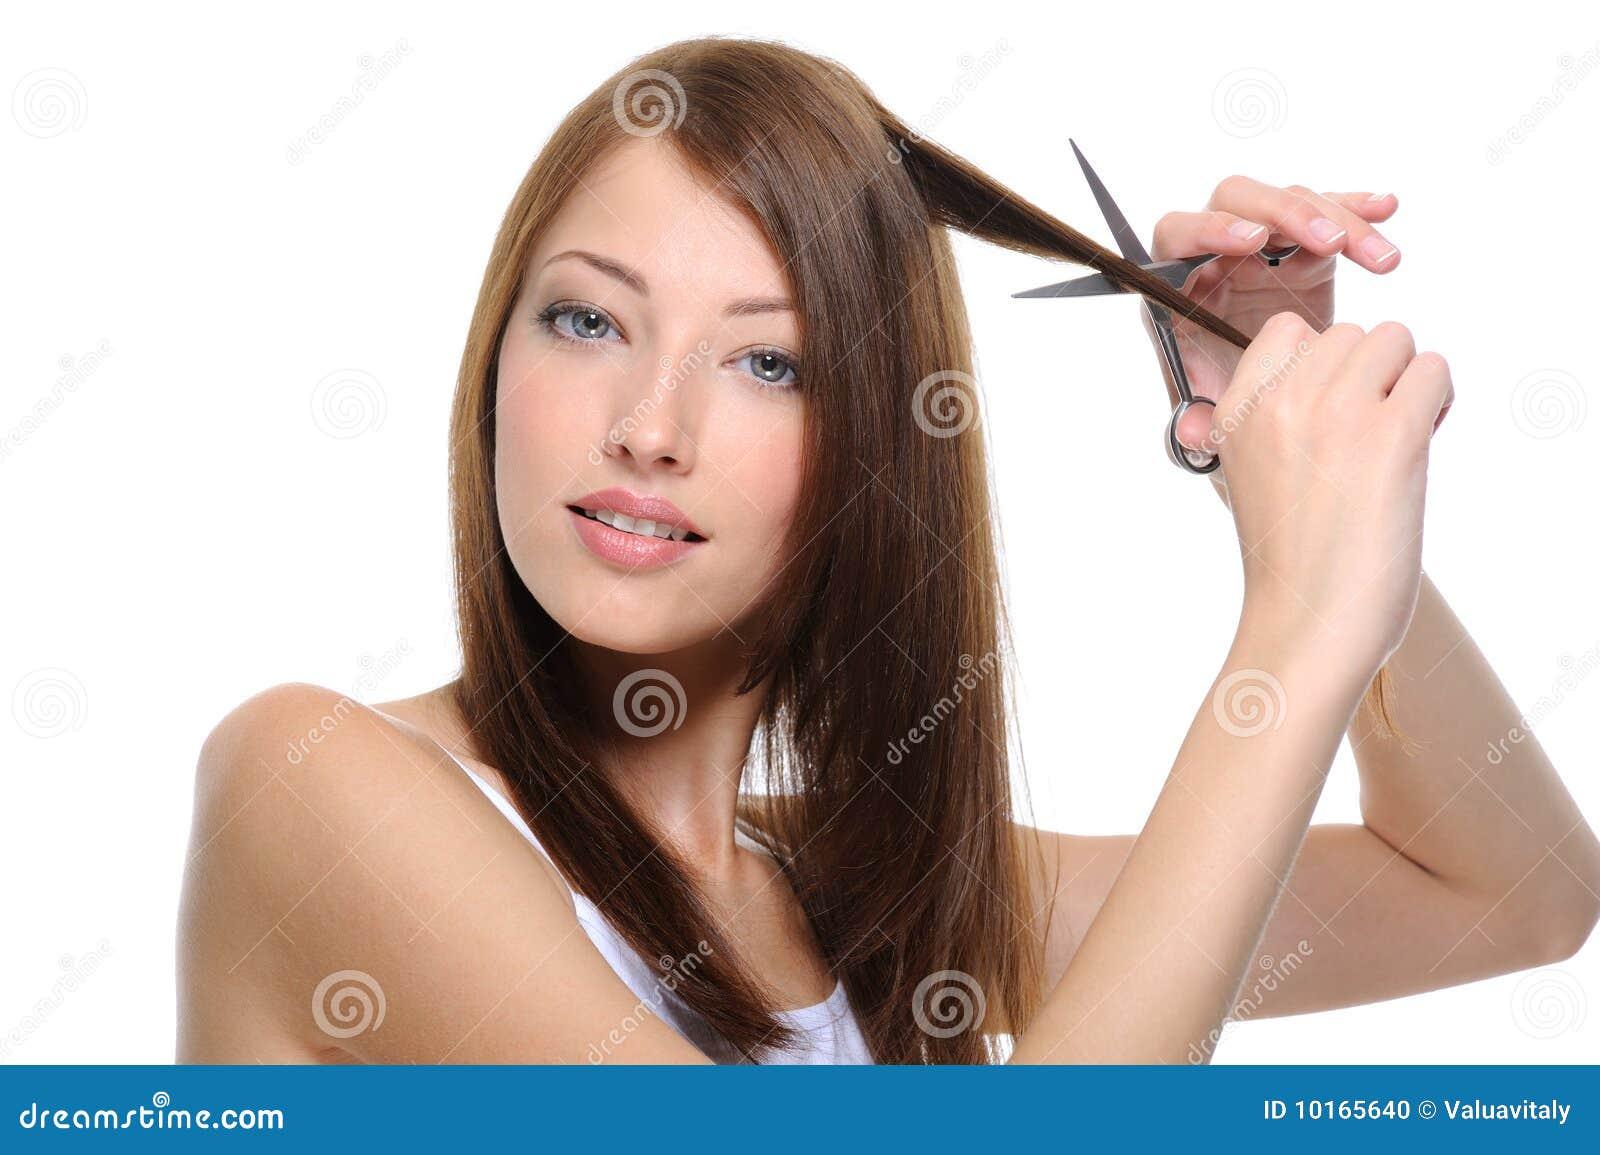 Подстригла сама себе волосы во сне